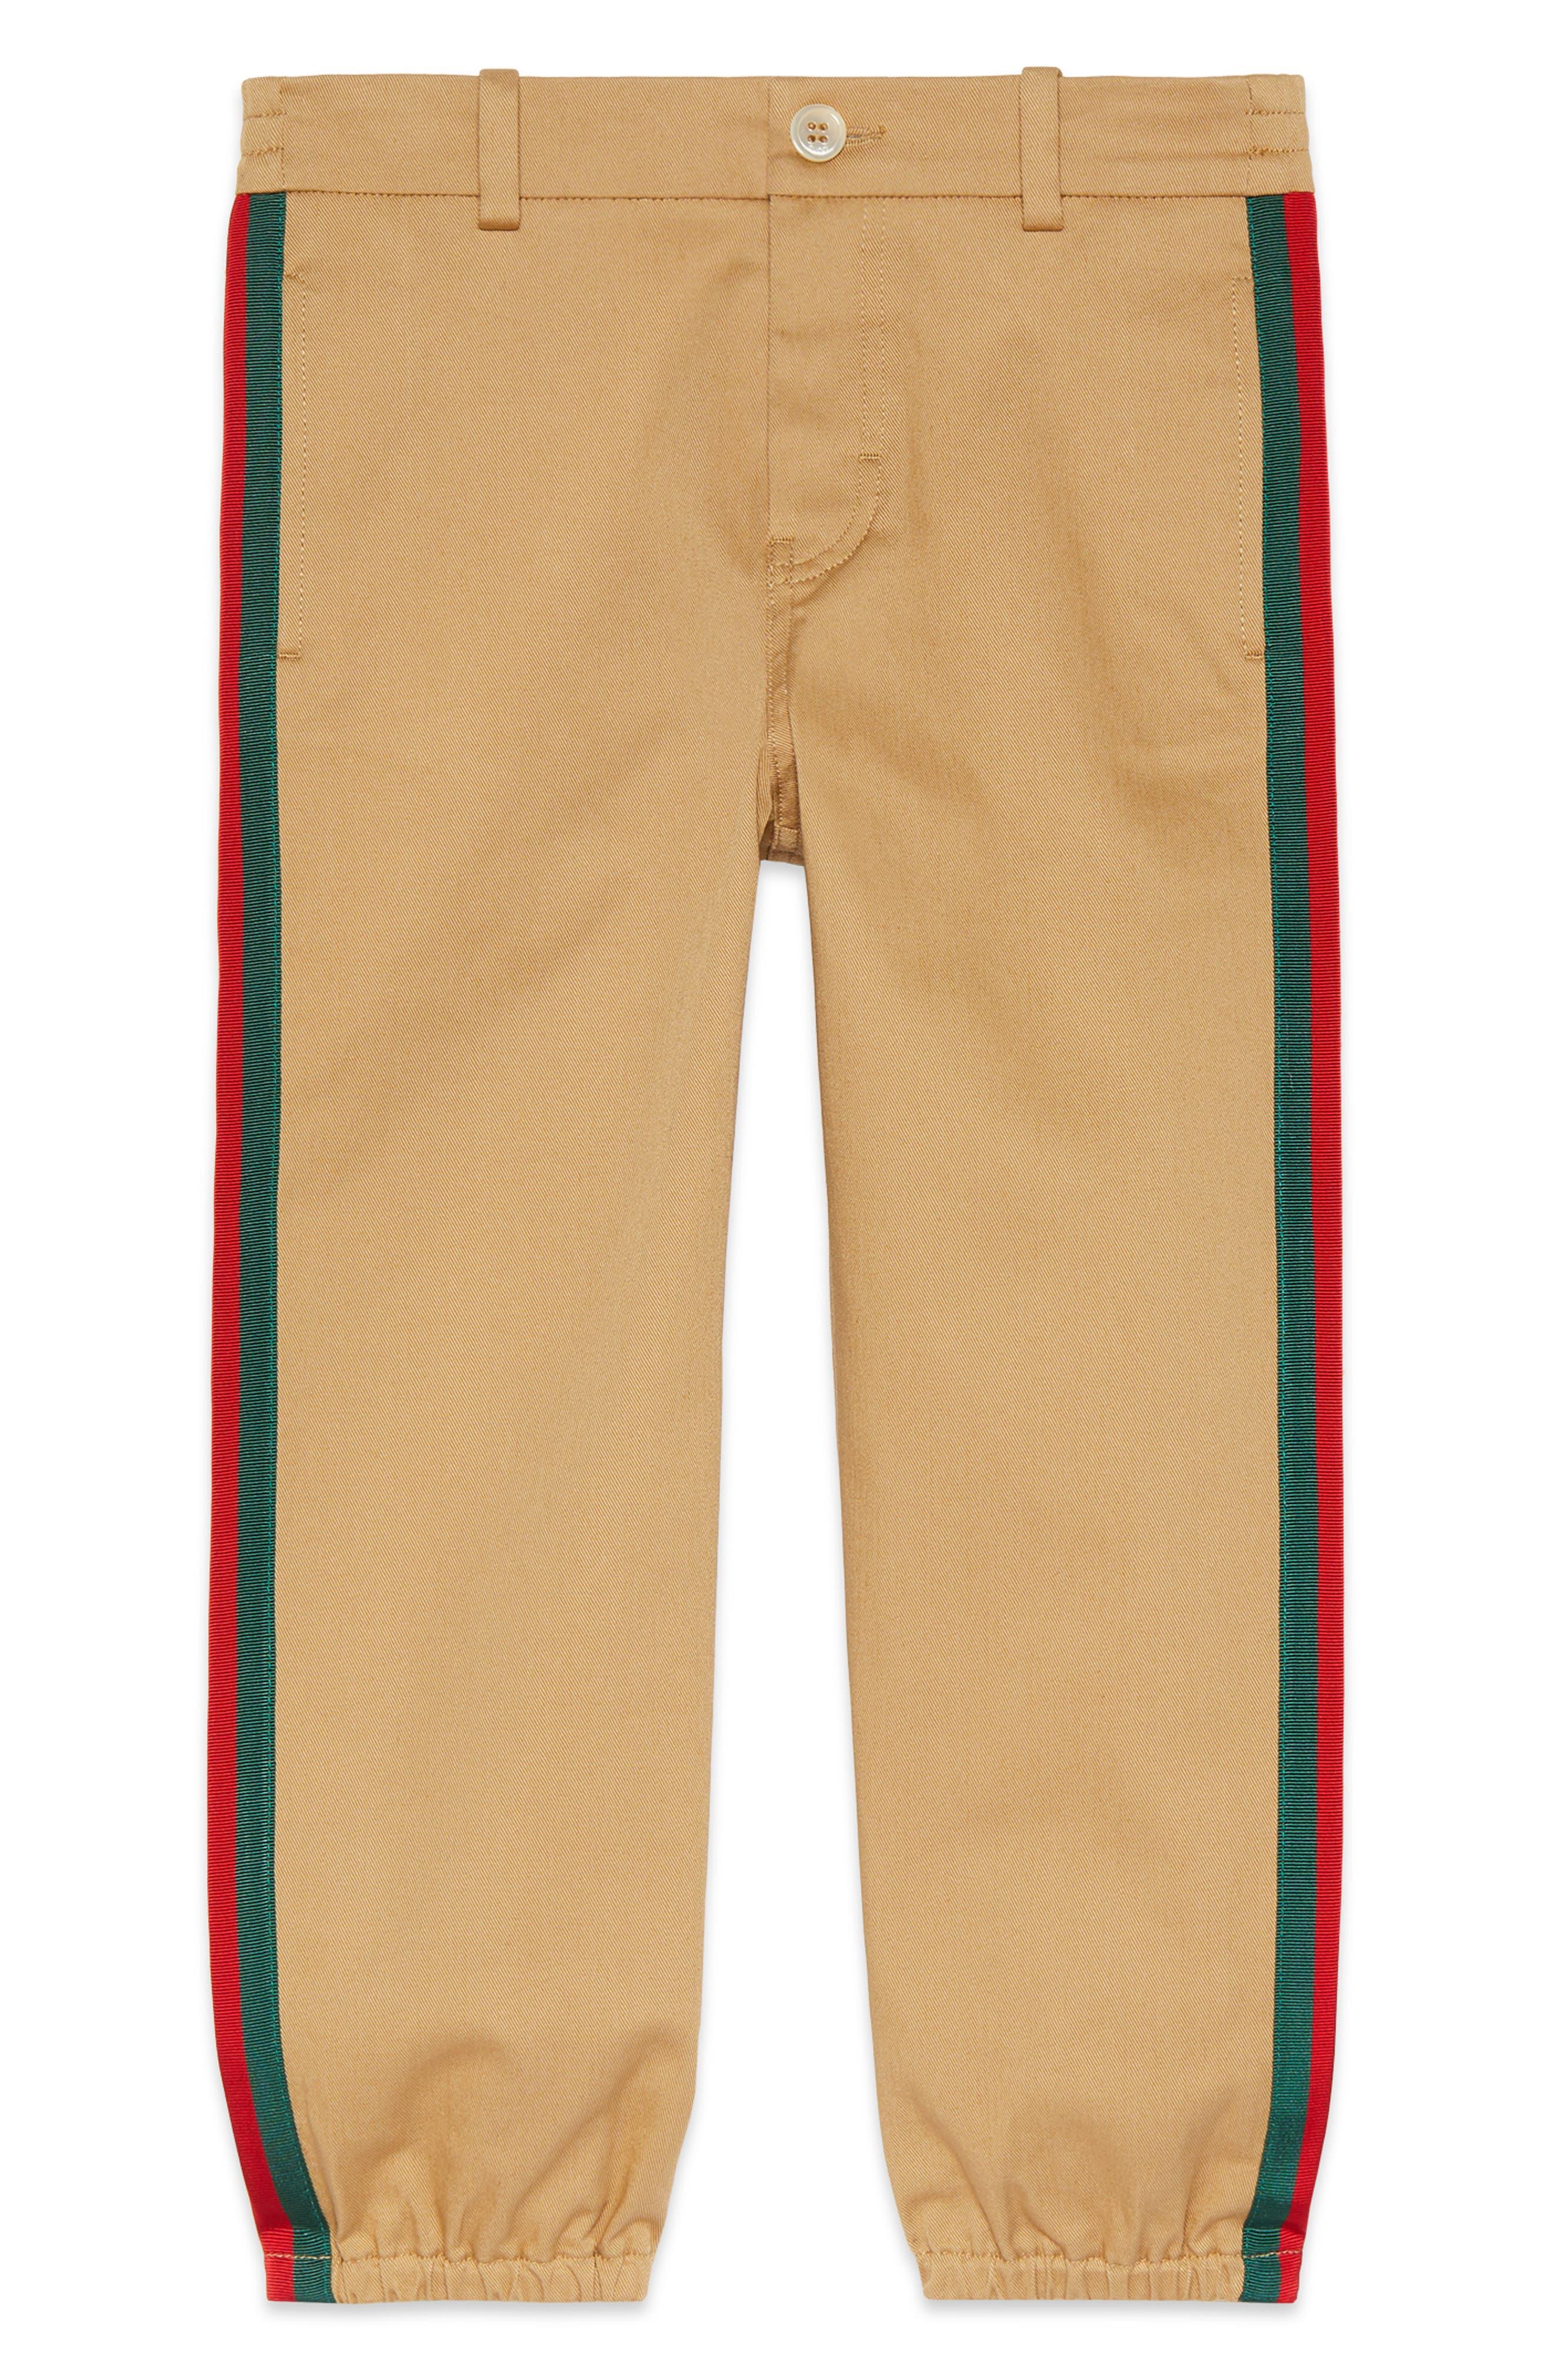 Boys' Gucci Clothing: Hoodies, Shirts